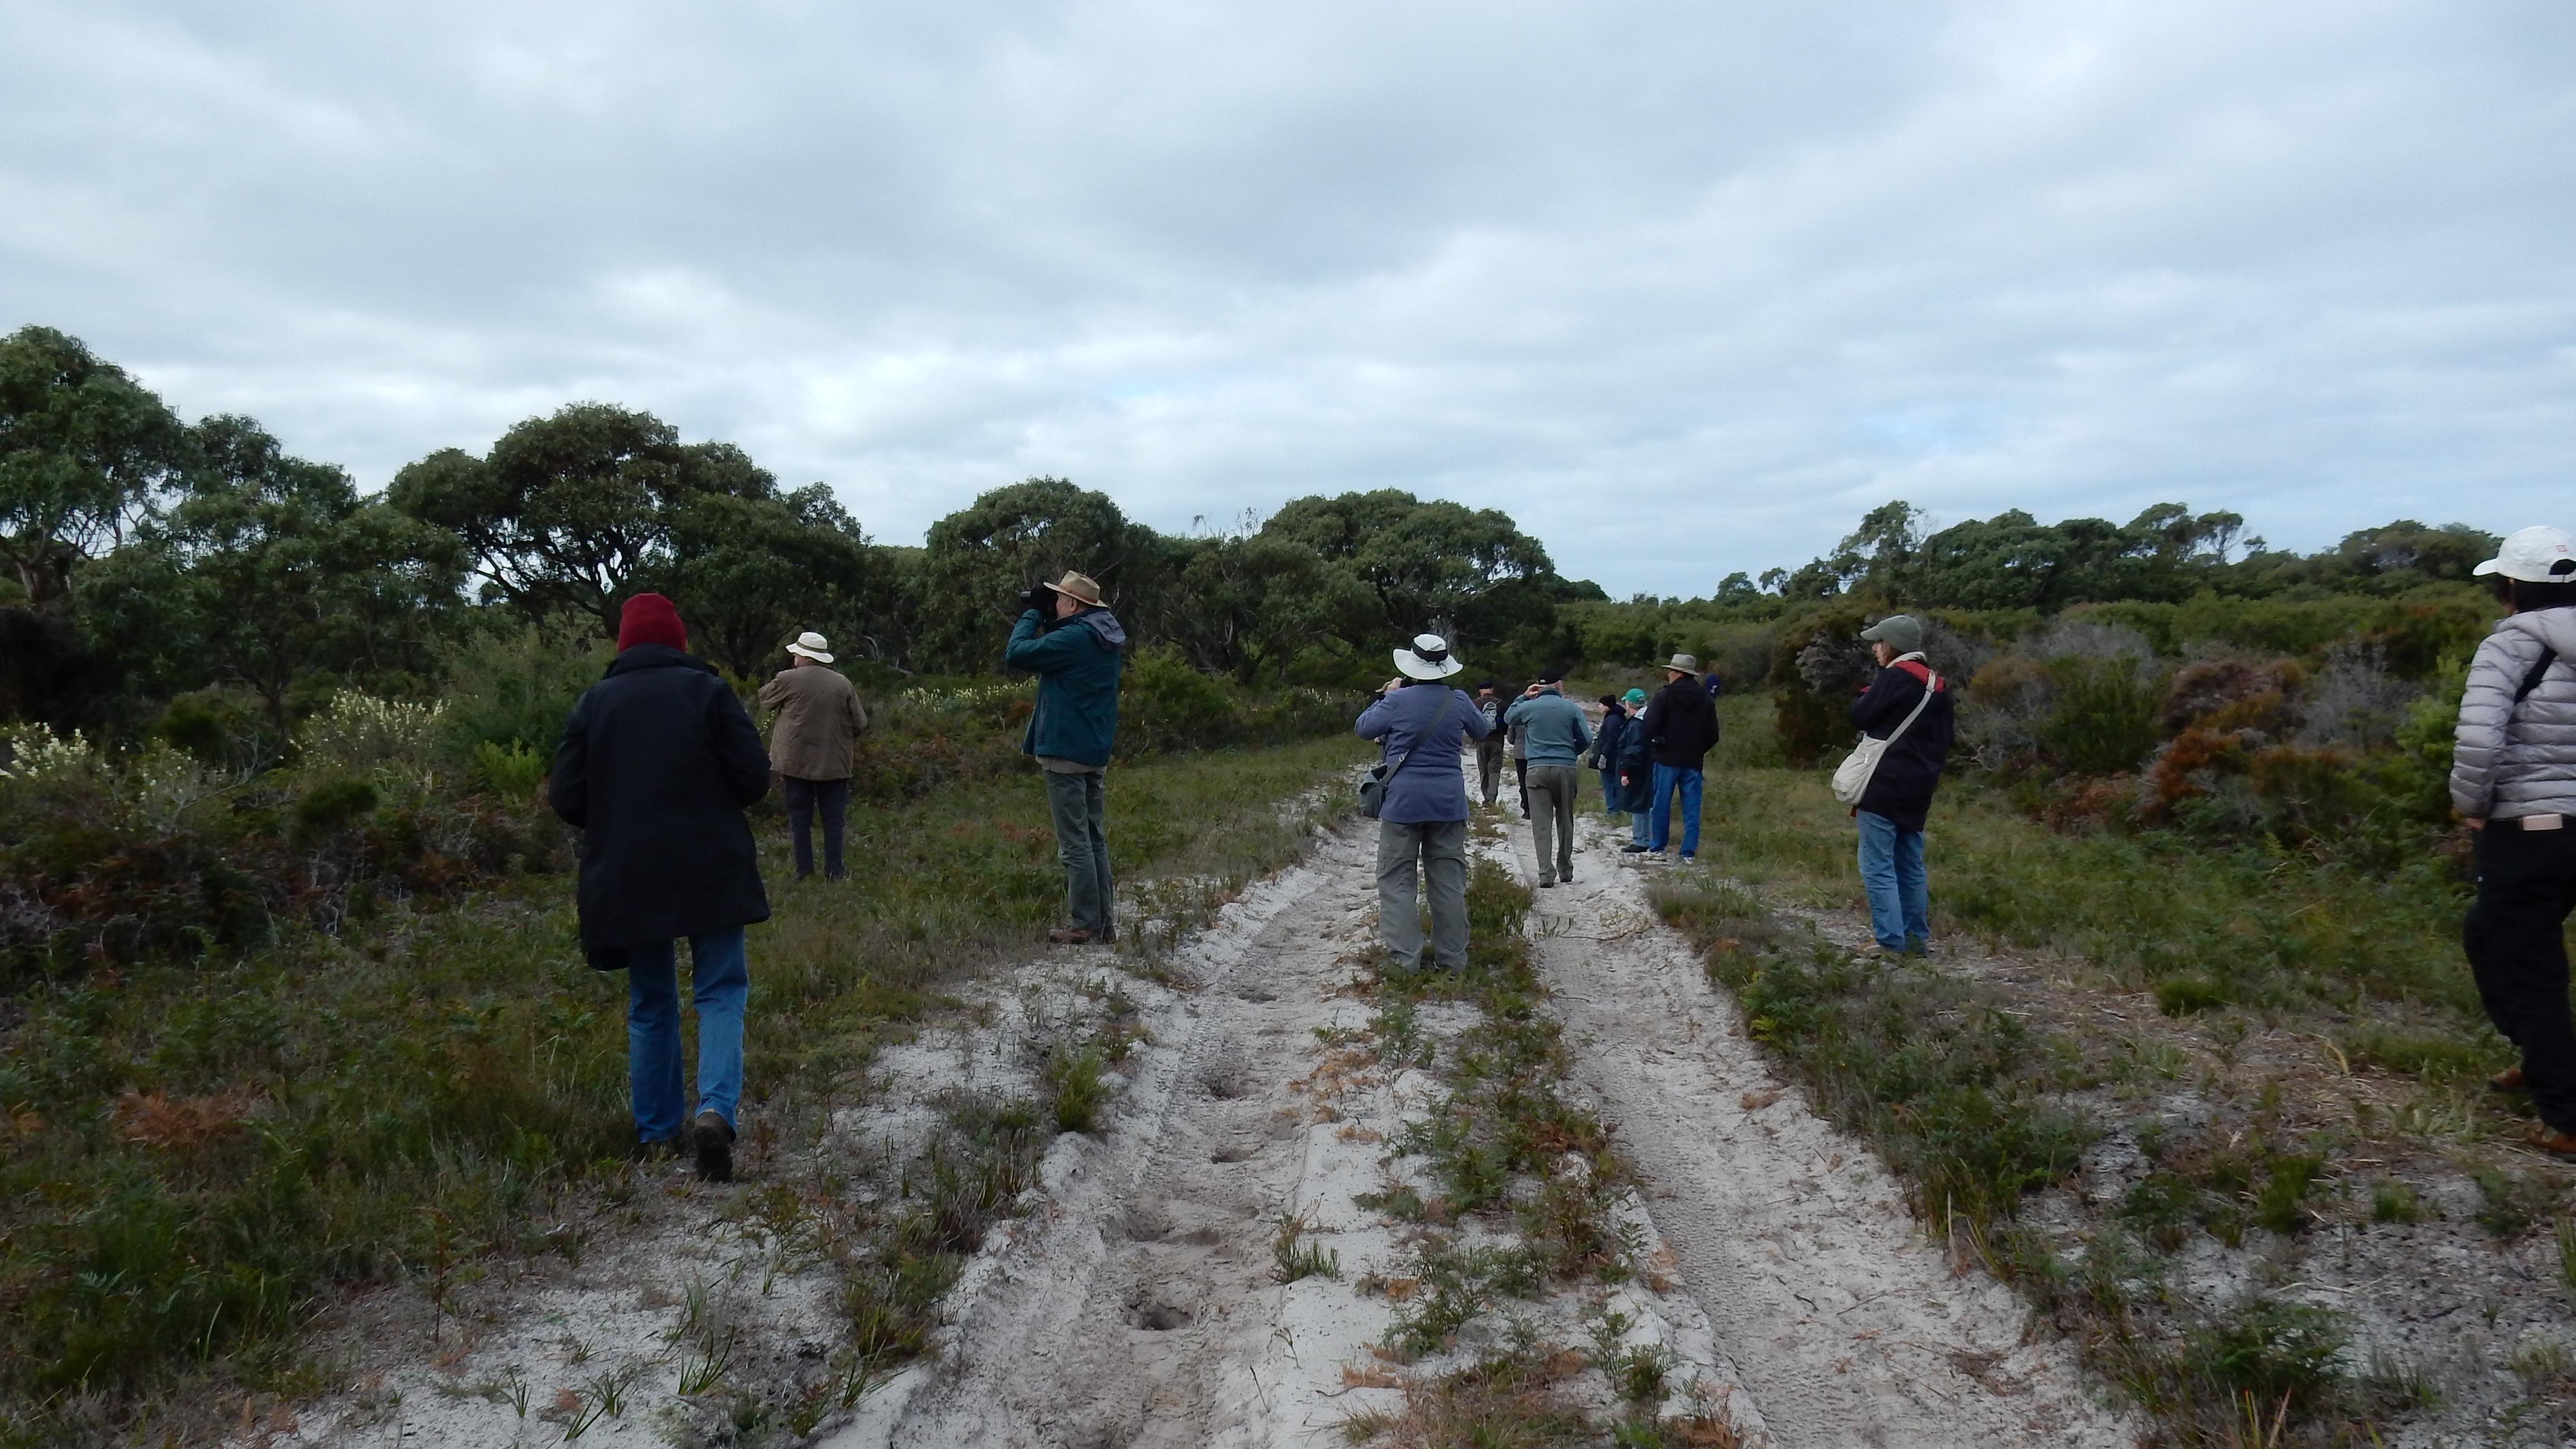 Walking the heathland track - Tweeddale